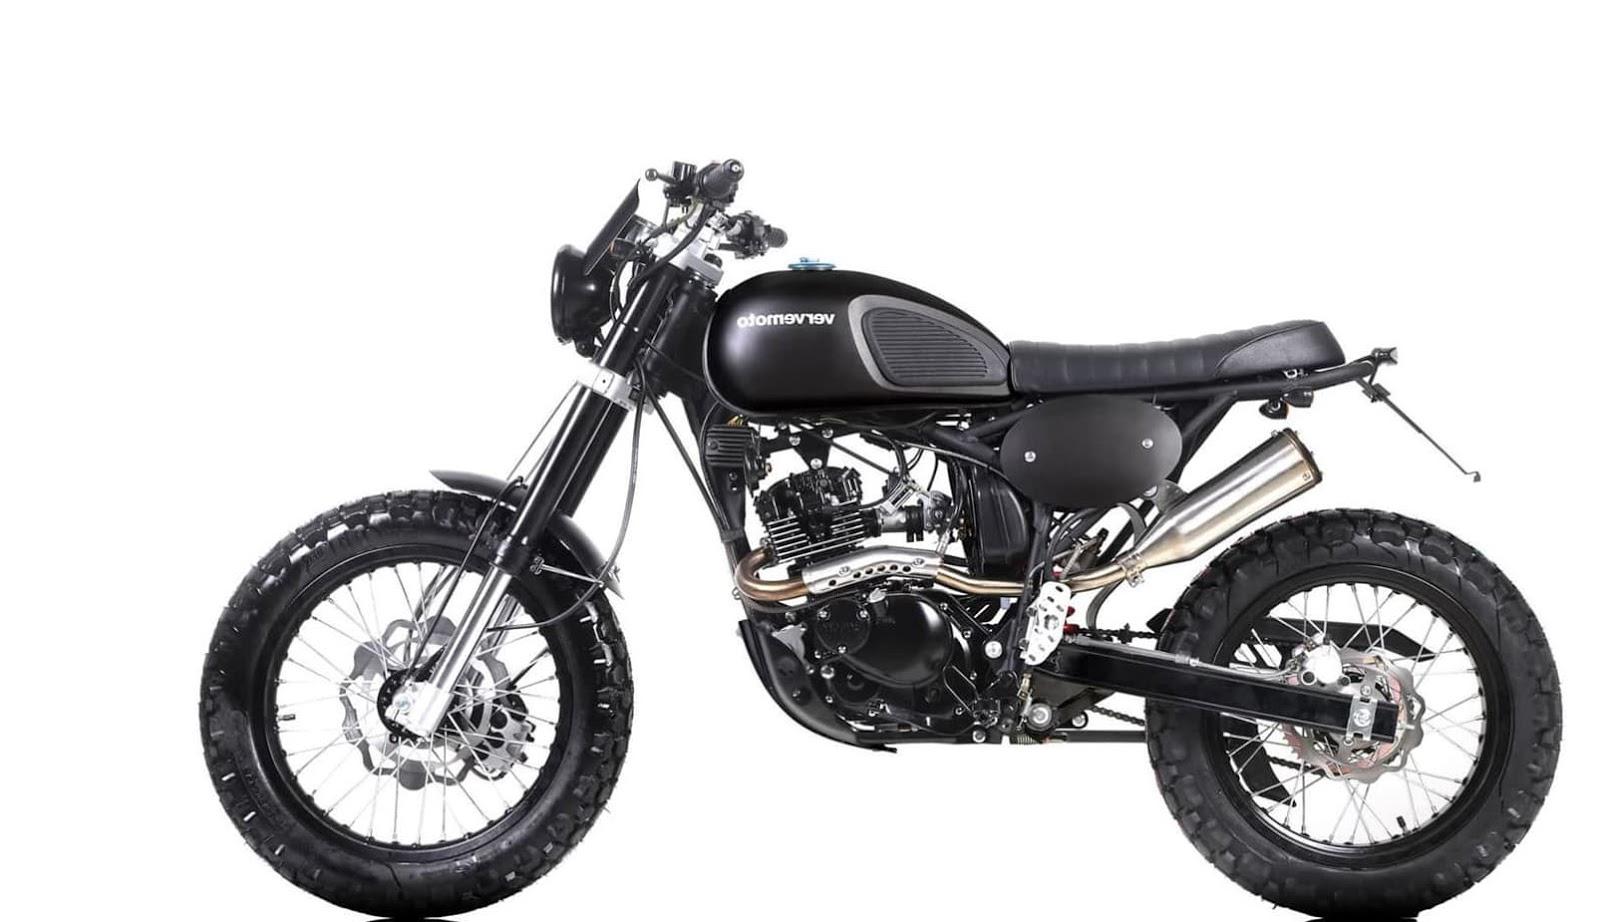 Sissi Moto Crema Usato verve moto tracker 125i and hero 125i spec